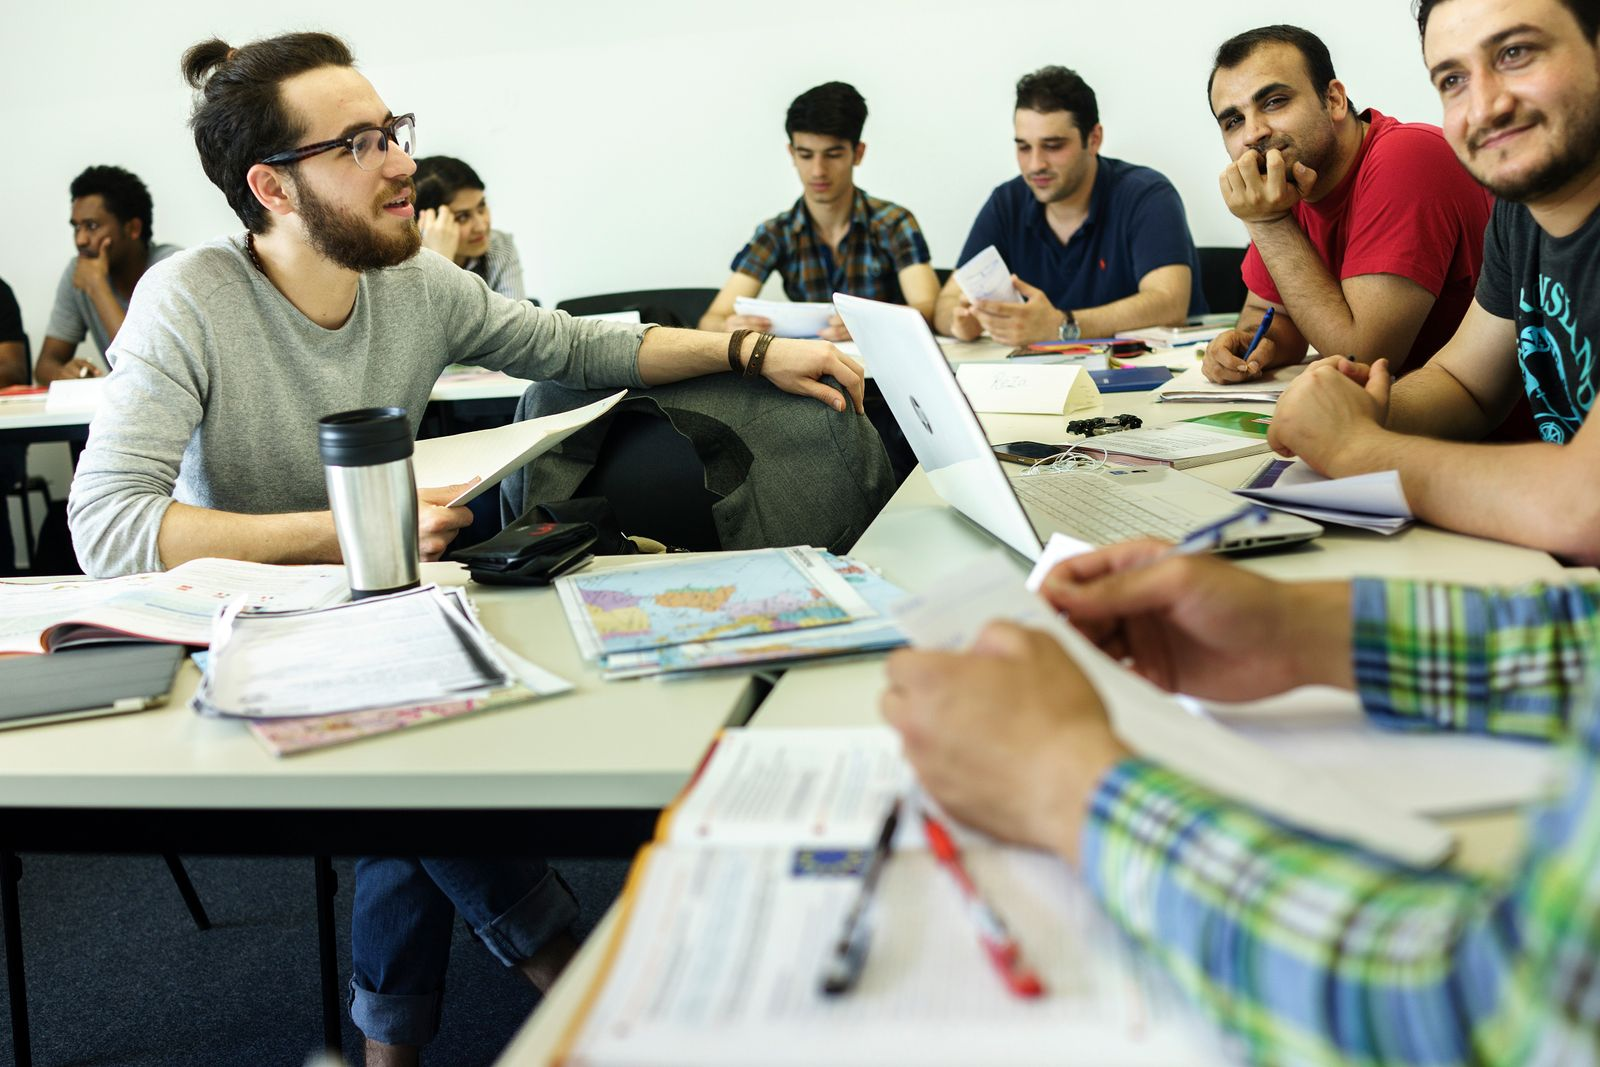 Flüchtlinge / Ausbildung / Studium